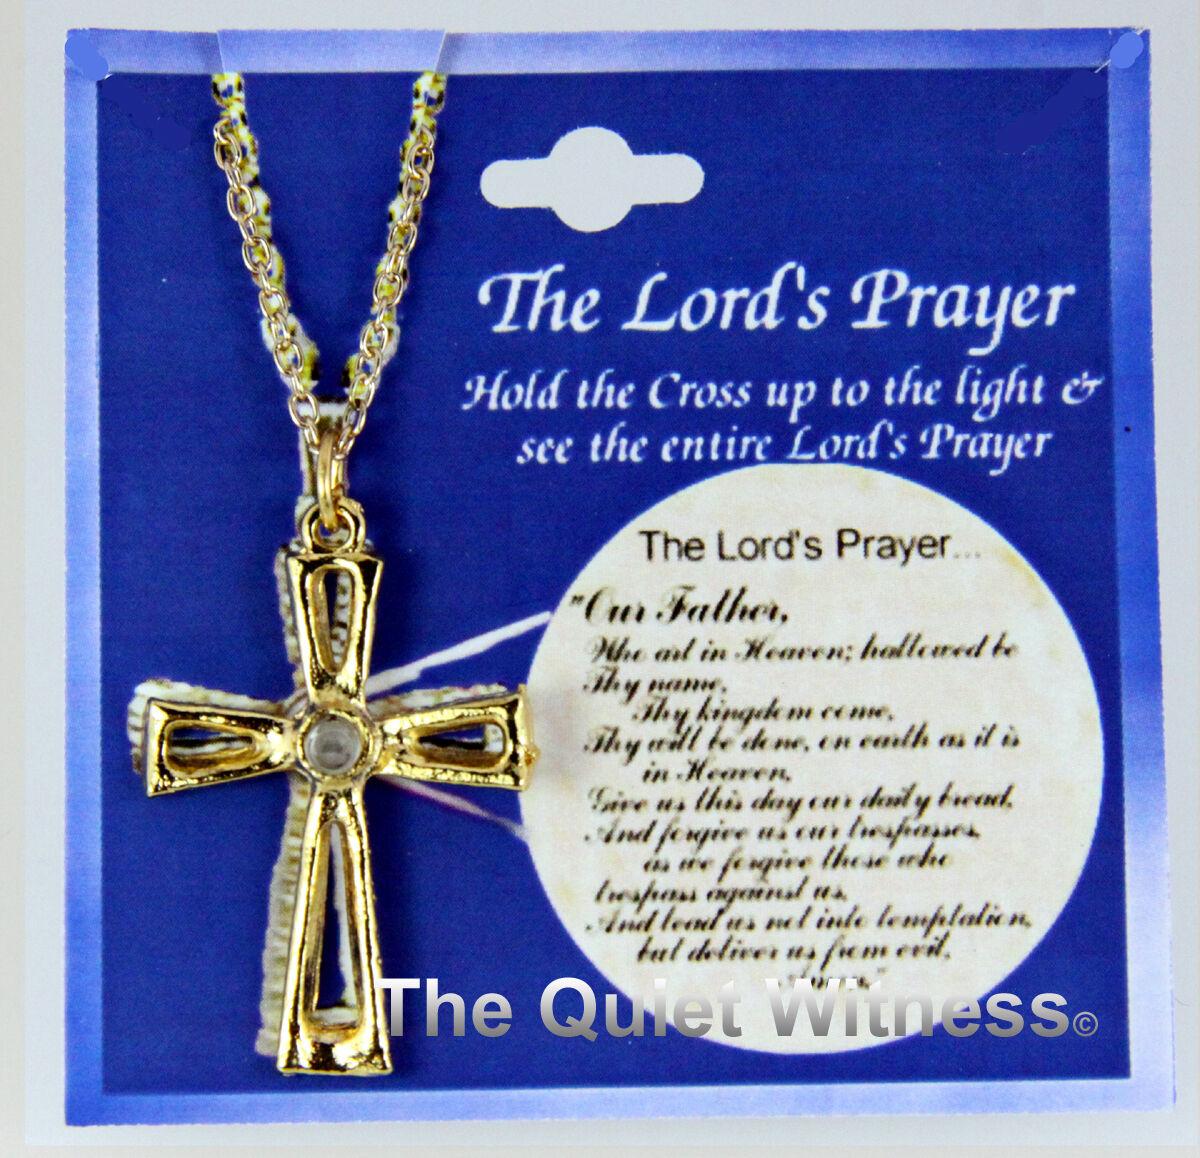 Rif-Home Olive Wood Jesus Cross Laser Pendant 8cm or 3.15 Long